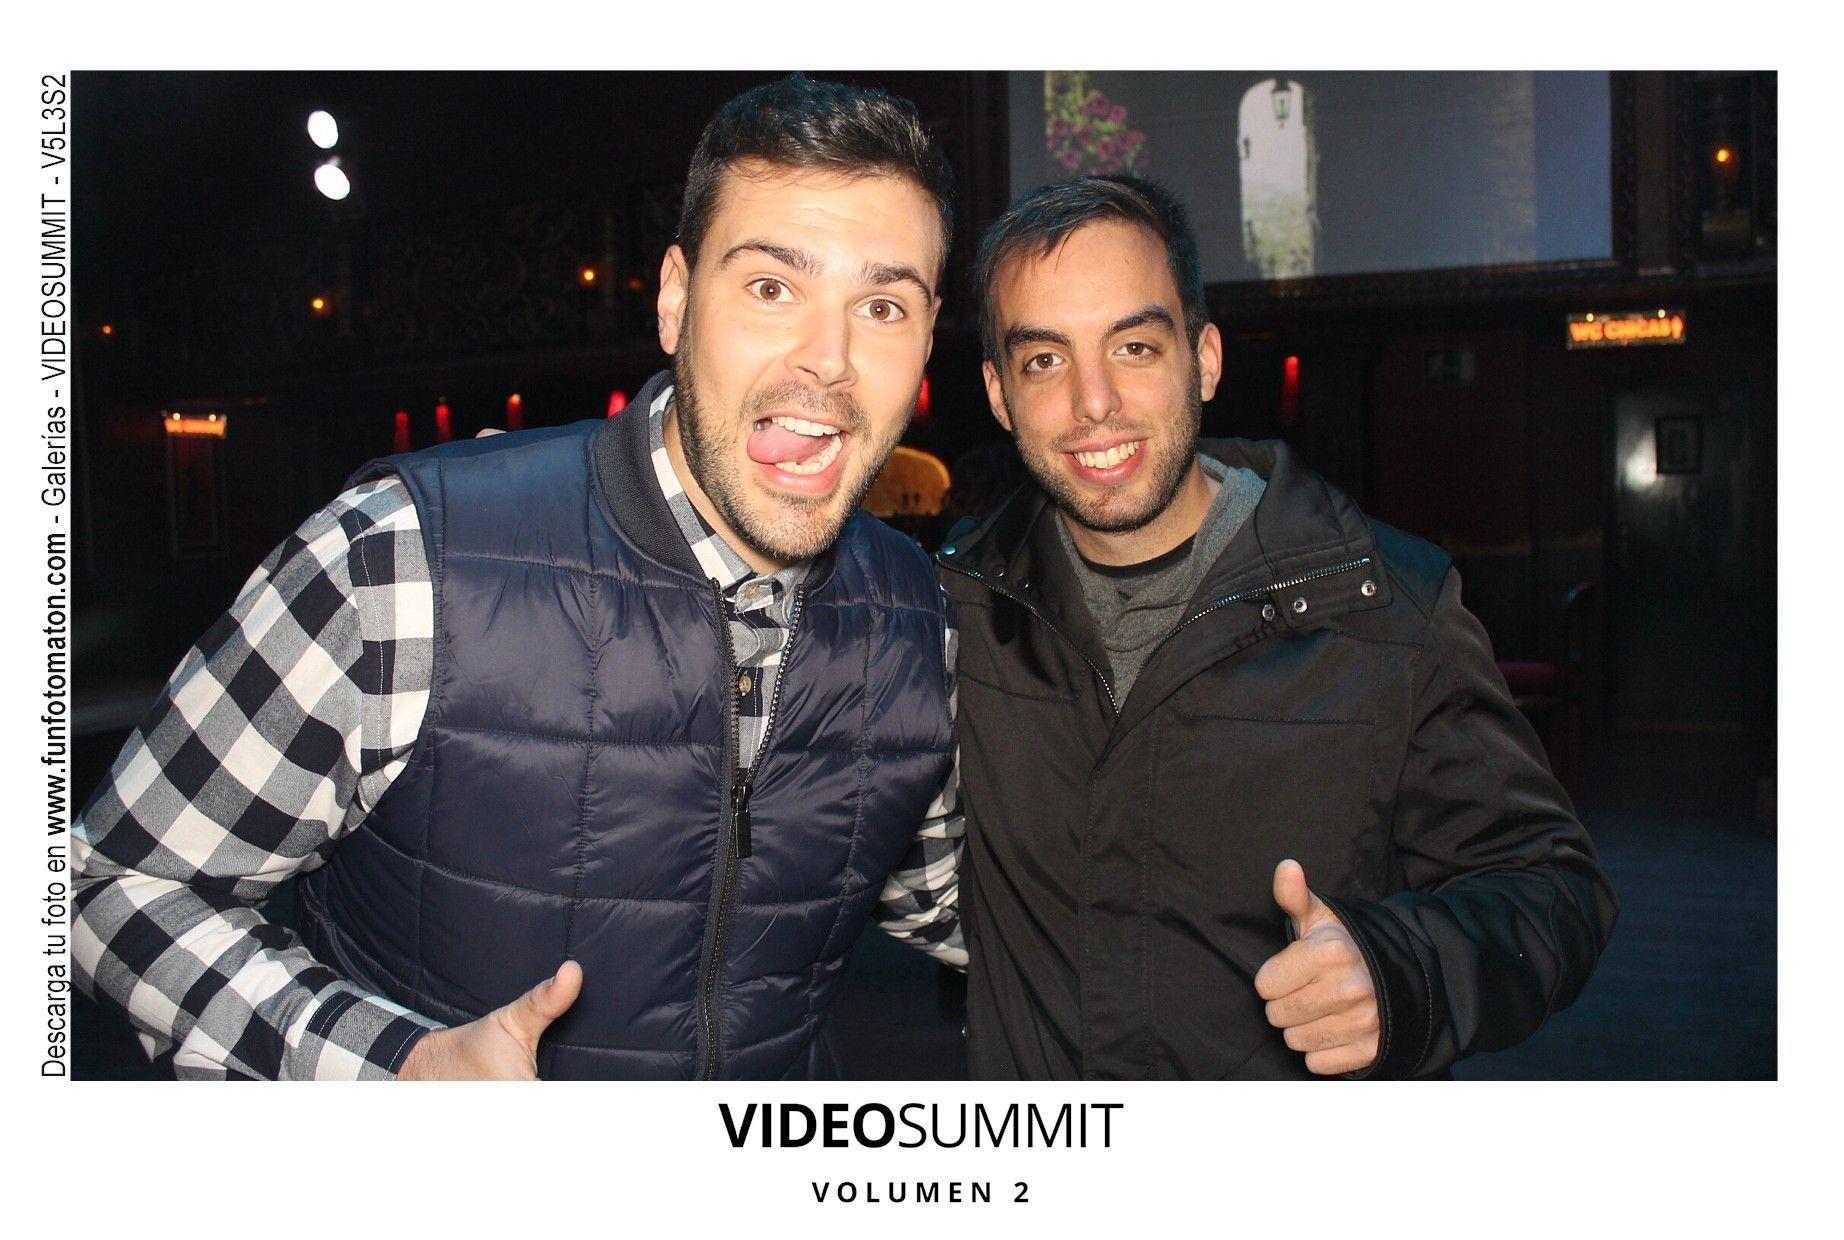 videosummit-vol2-club-party-078